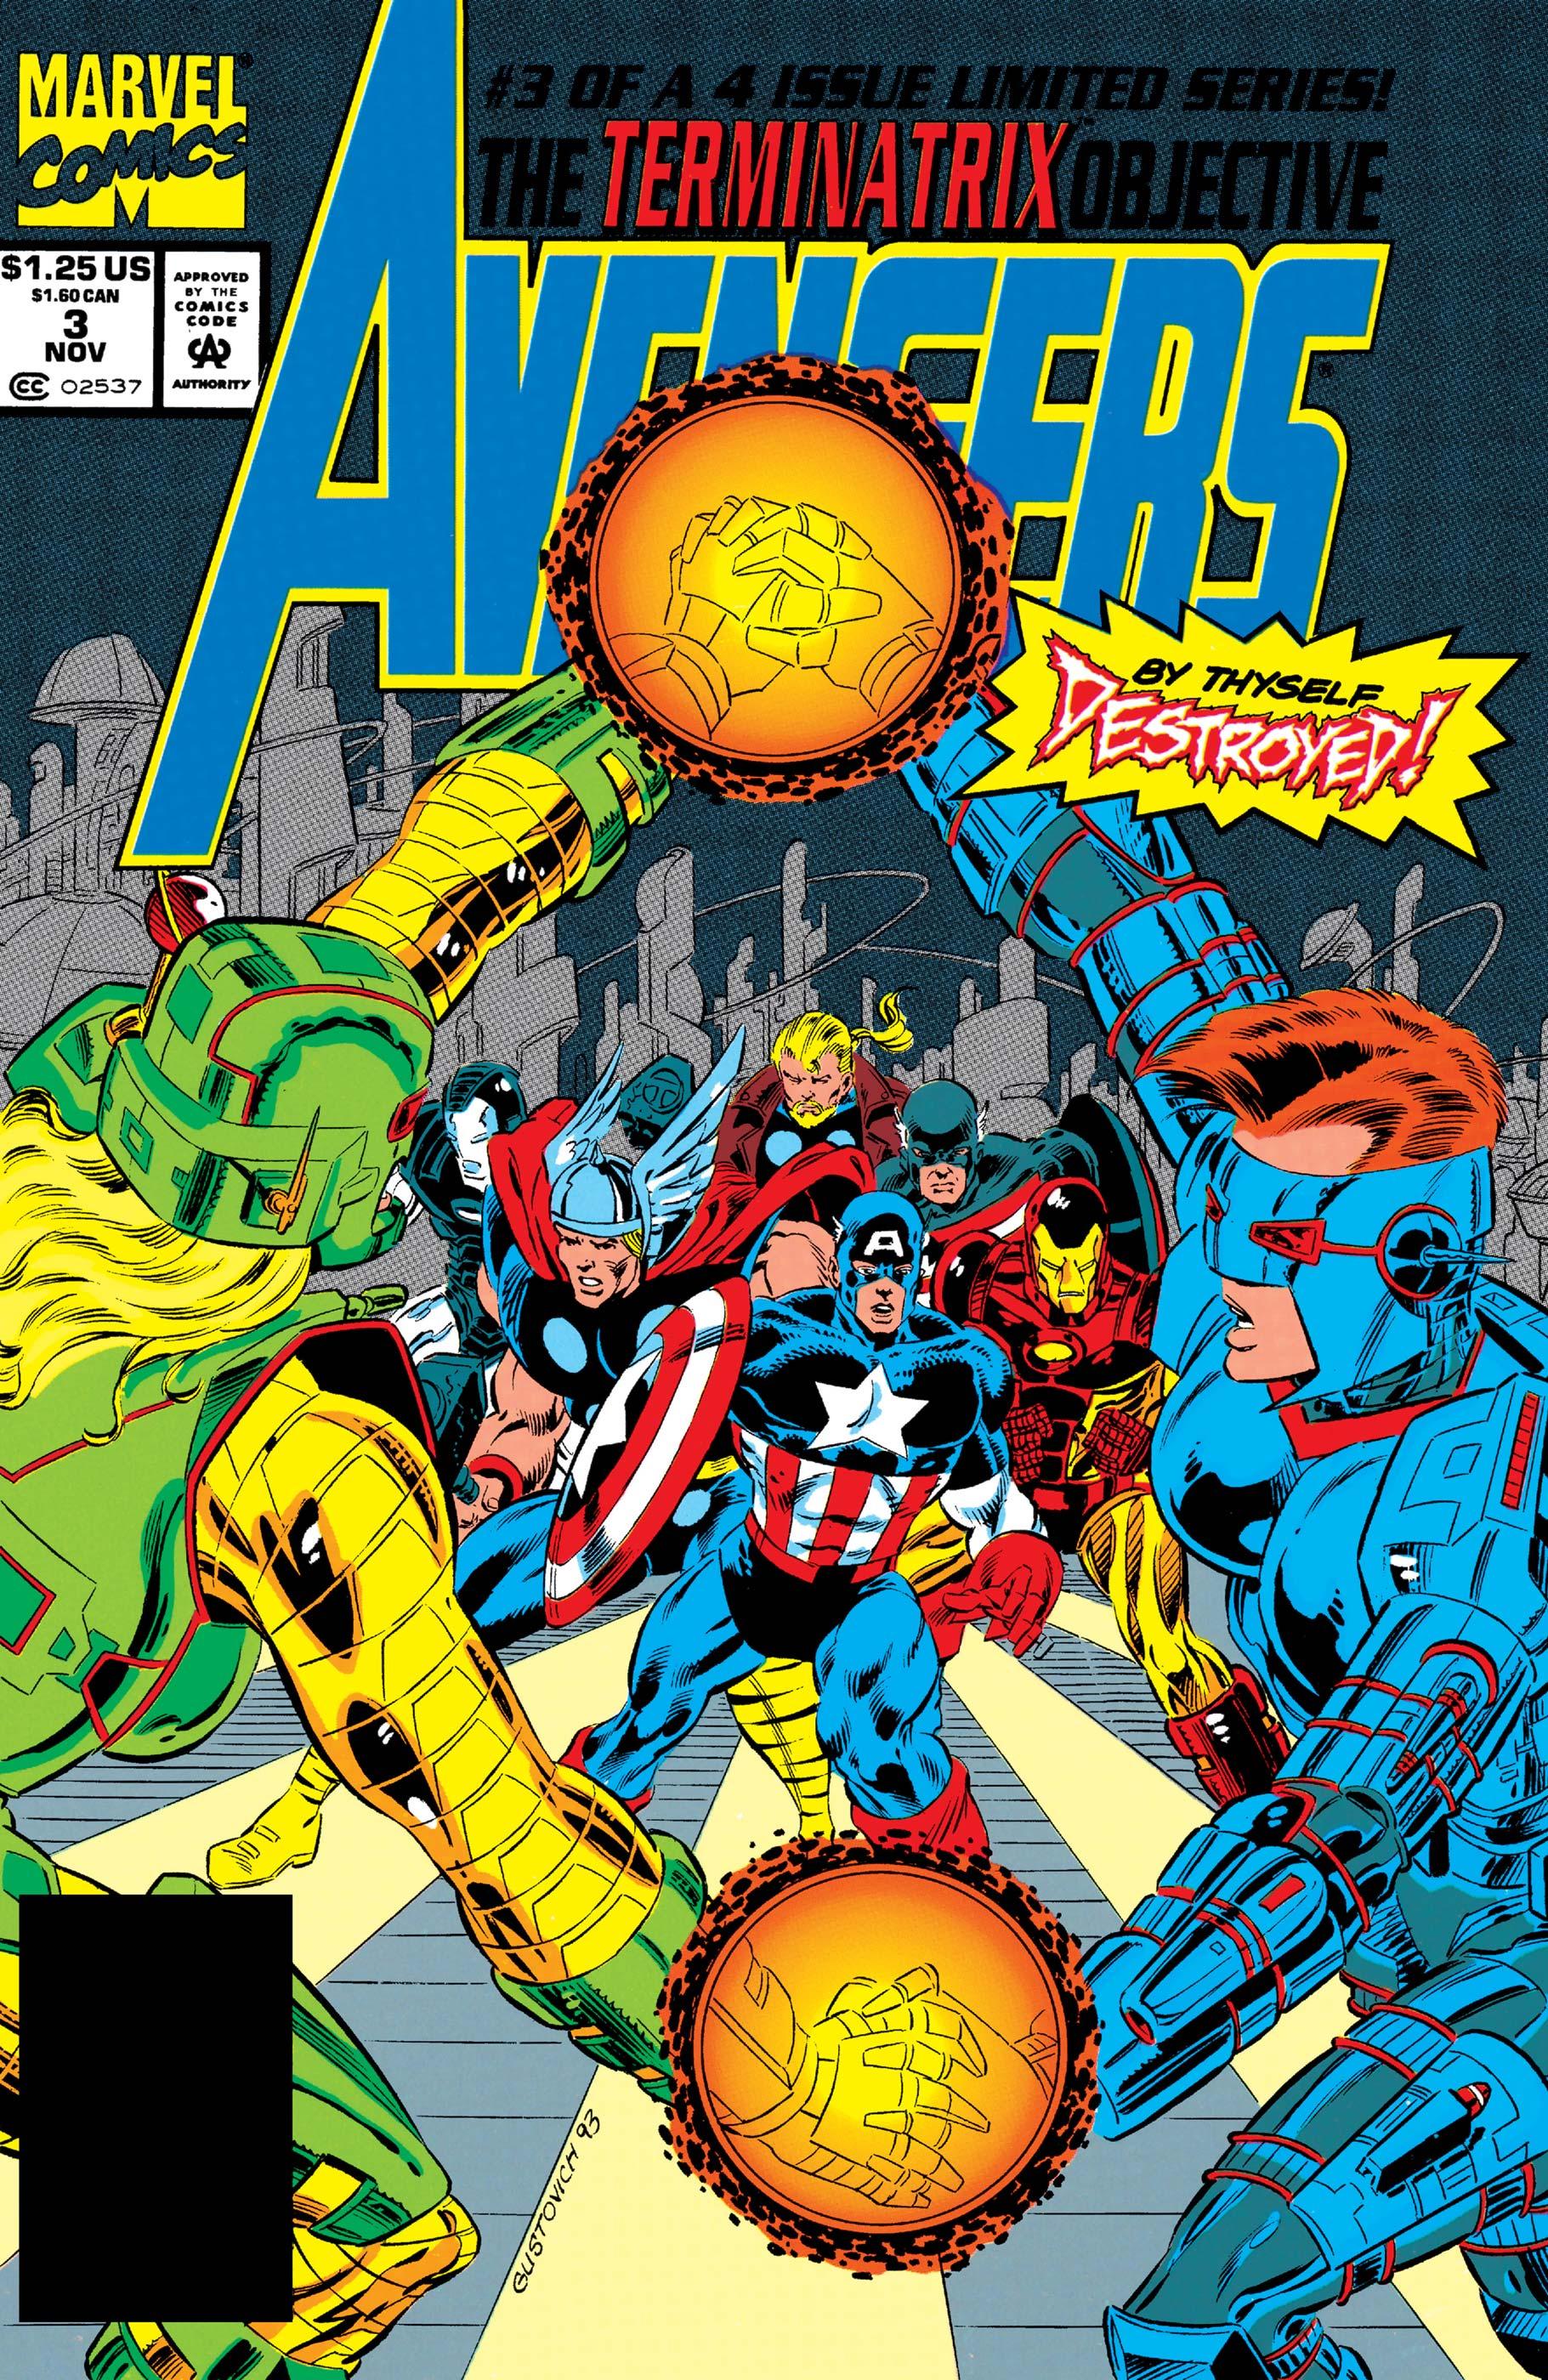 Avengers: The Terminatrix Objective (1993) #3